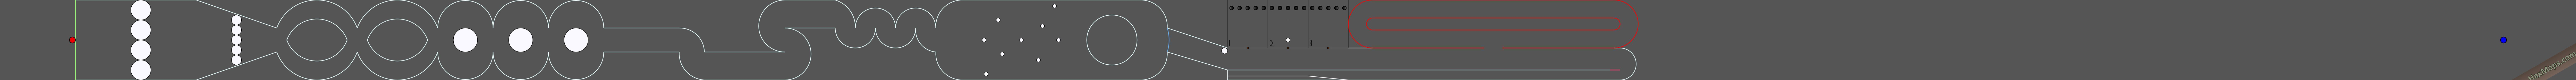 hax ball maps   Biathlon Track v1_3MAN_One Lap by Edmunds